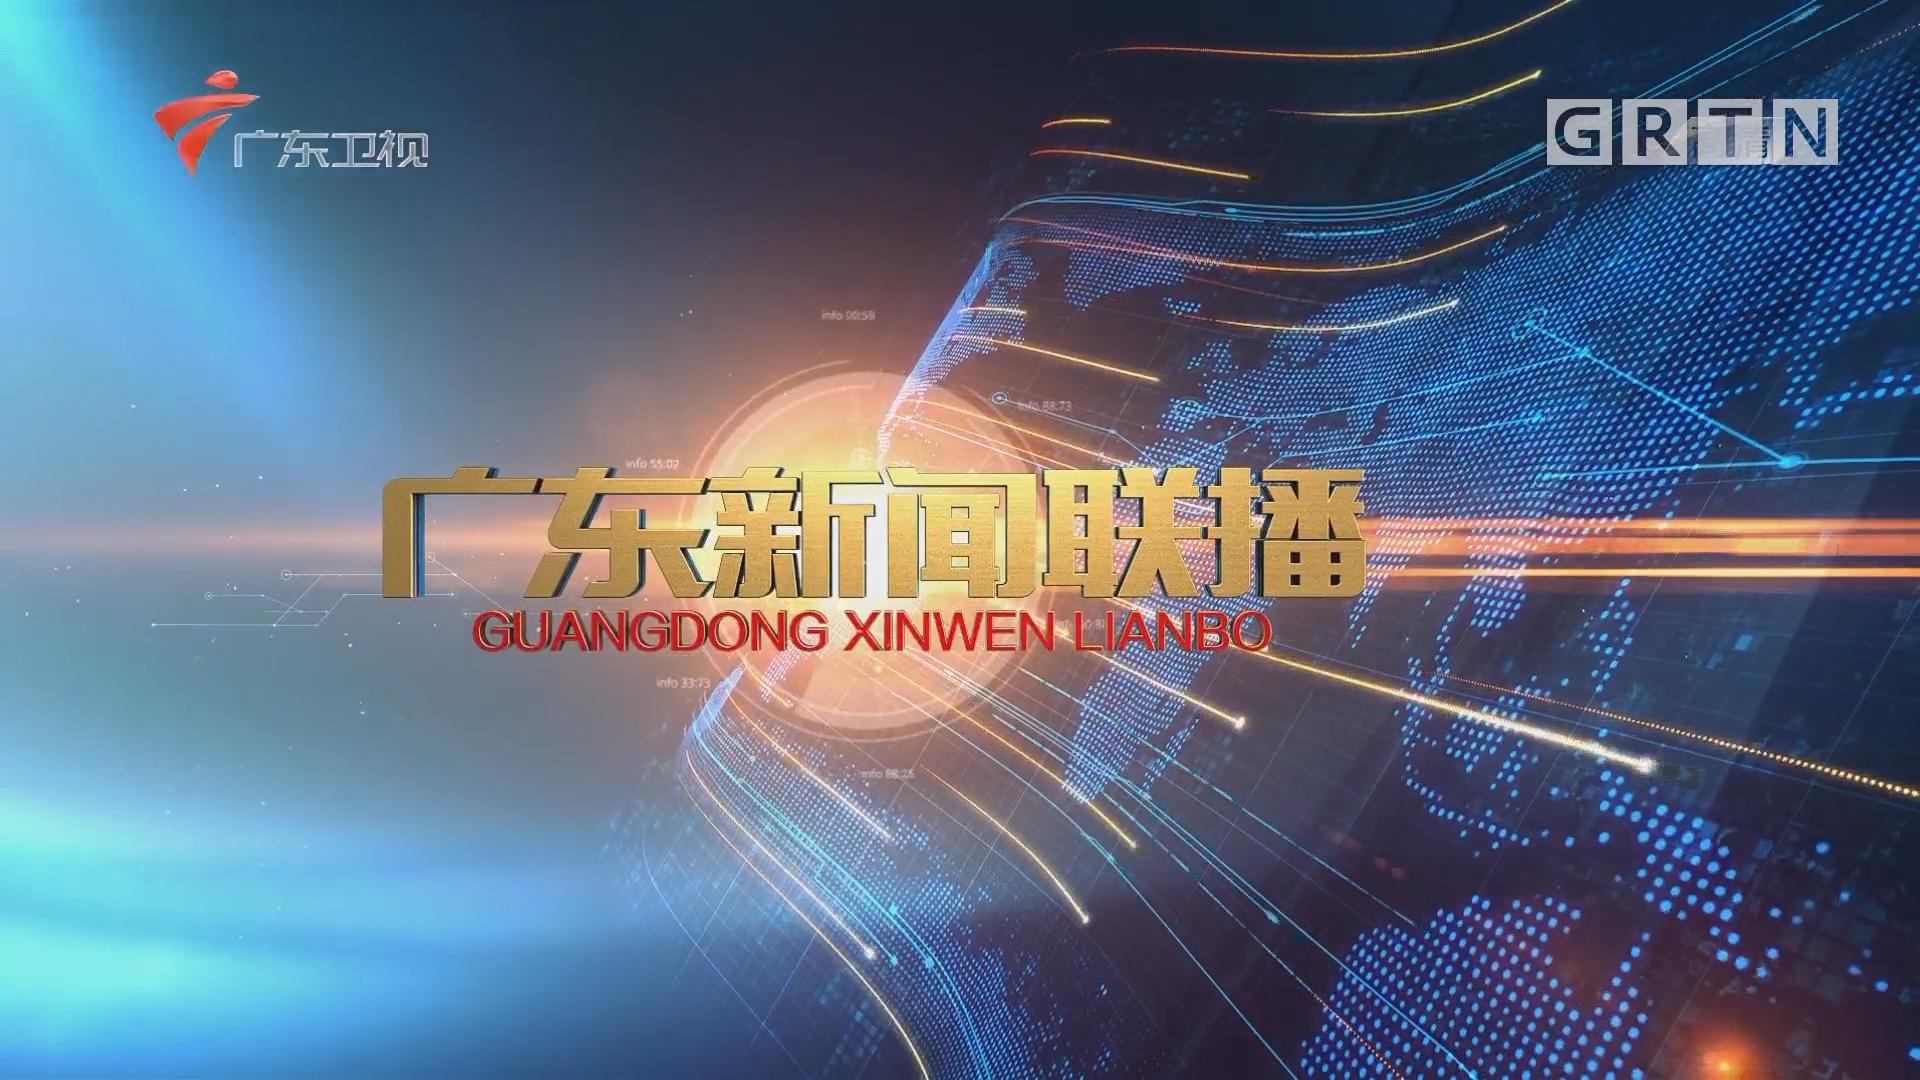 [HD][2018-10-23]广东新闻联播:习近平宣布:港珠澳大桥正式开通